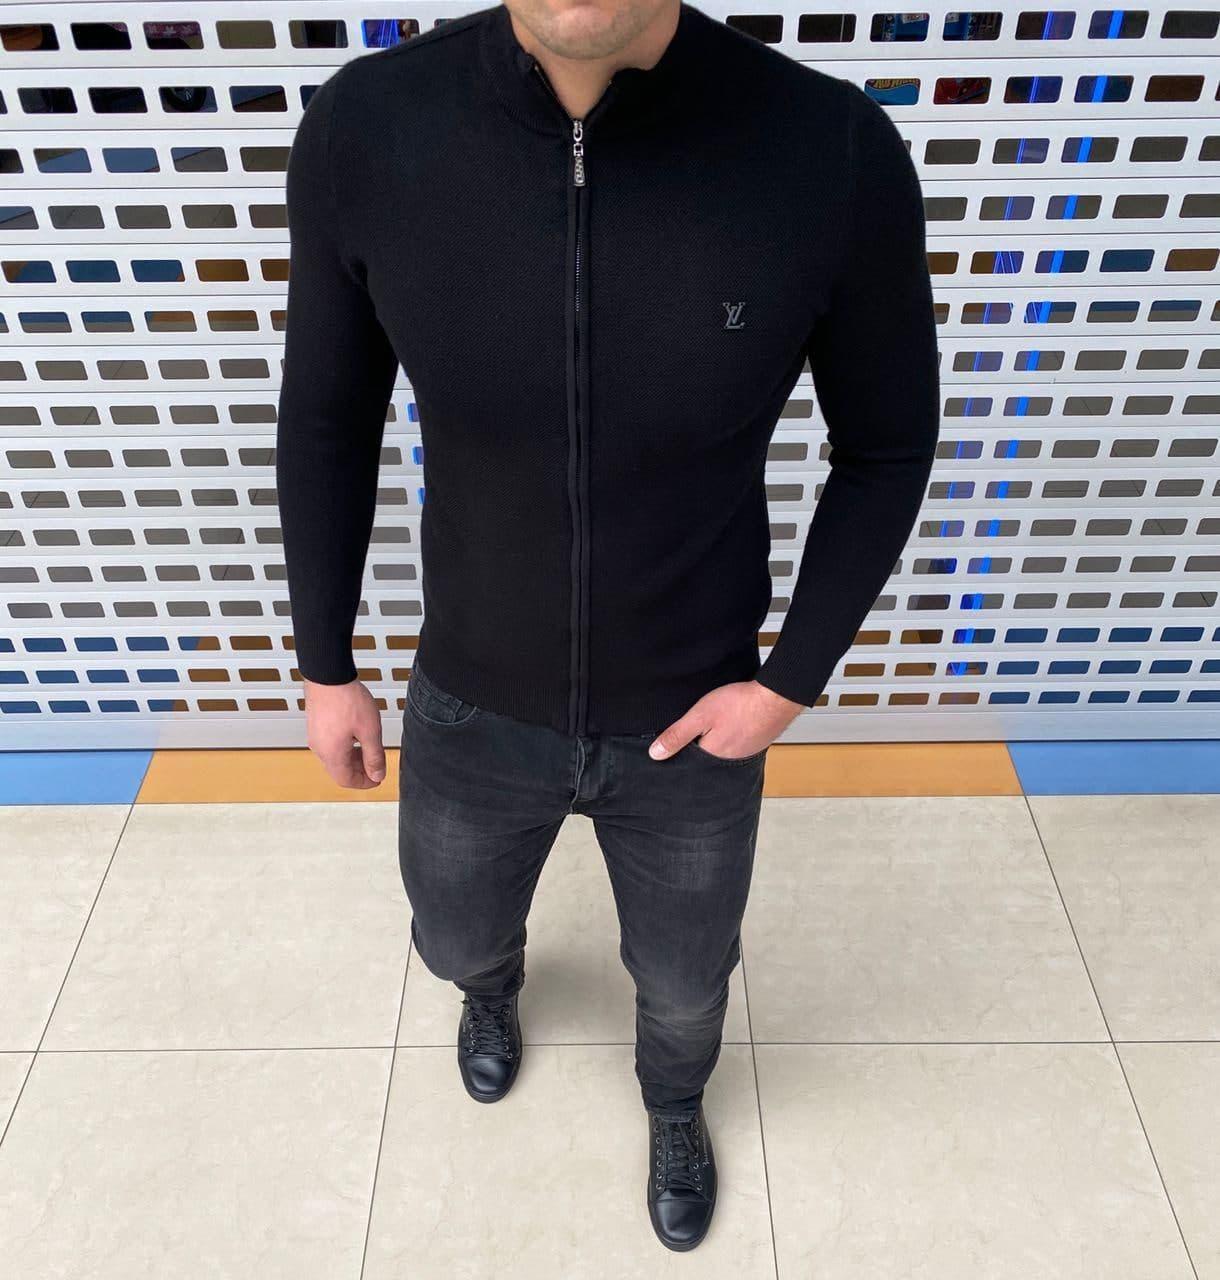 Мужская кофта на змейке Louis Vuitton H1094 черная